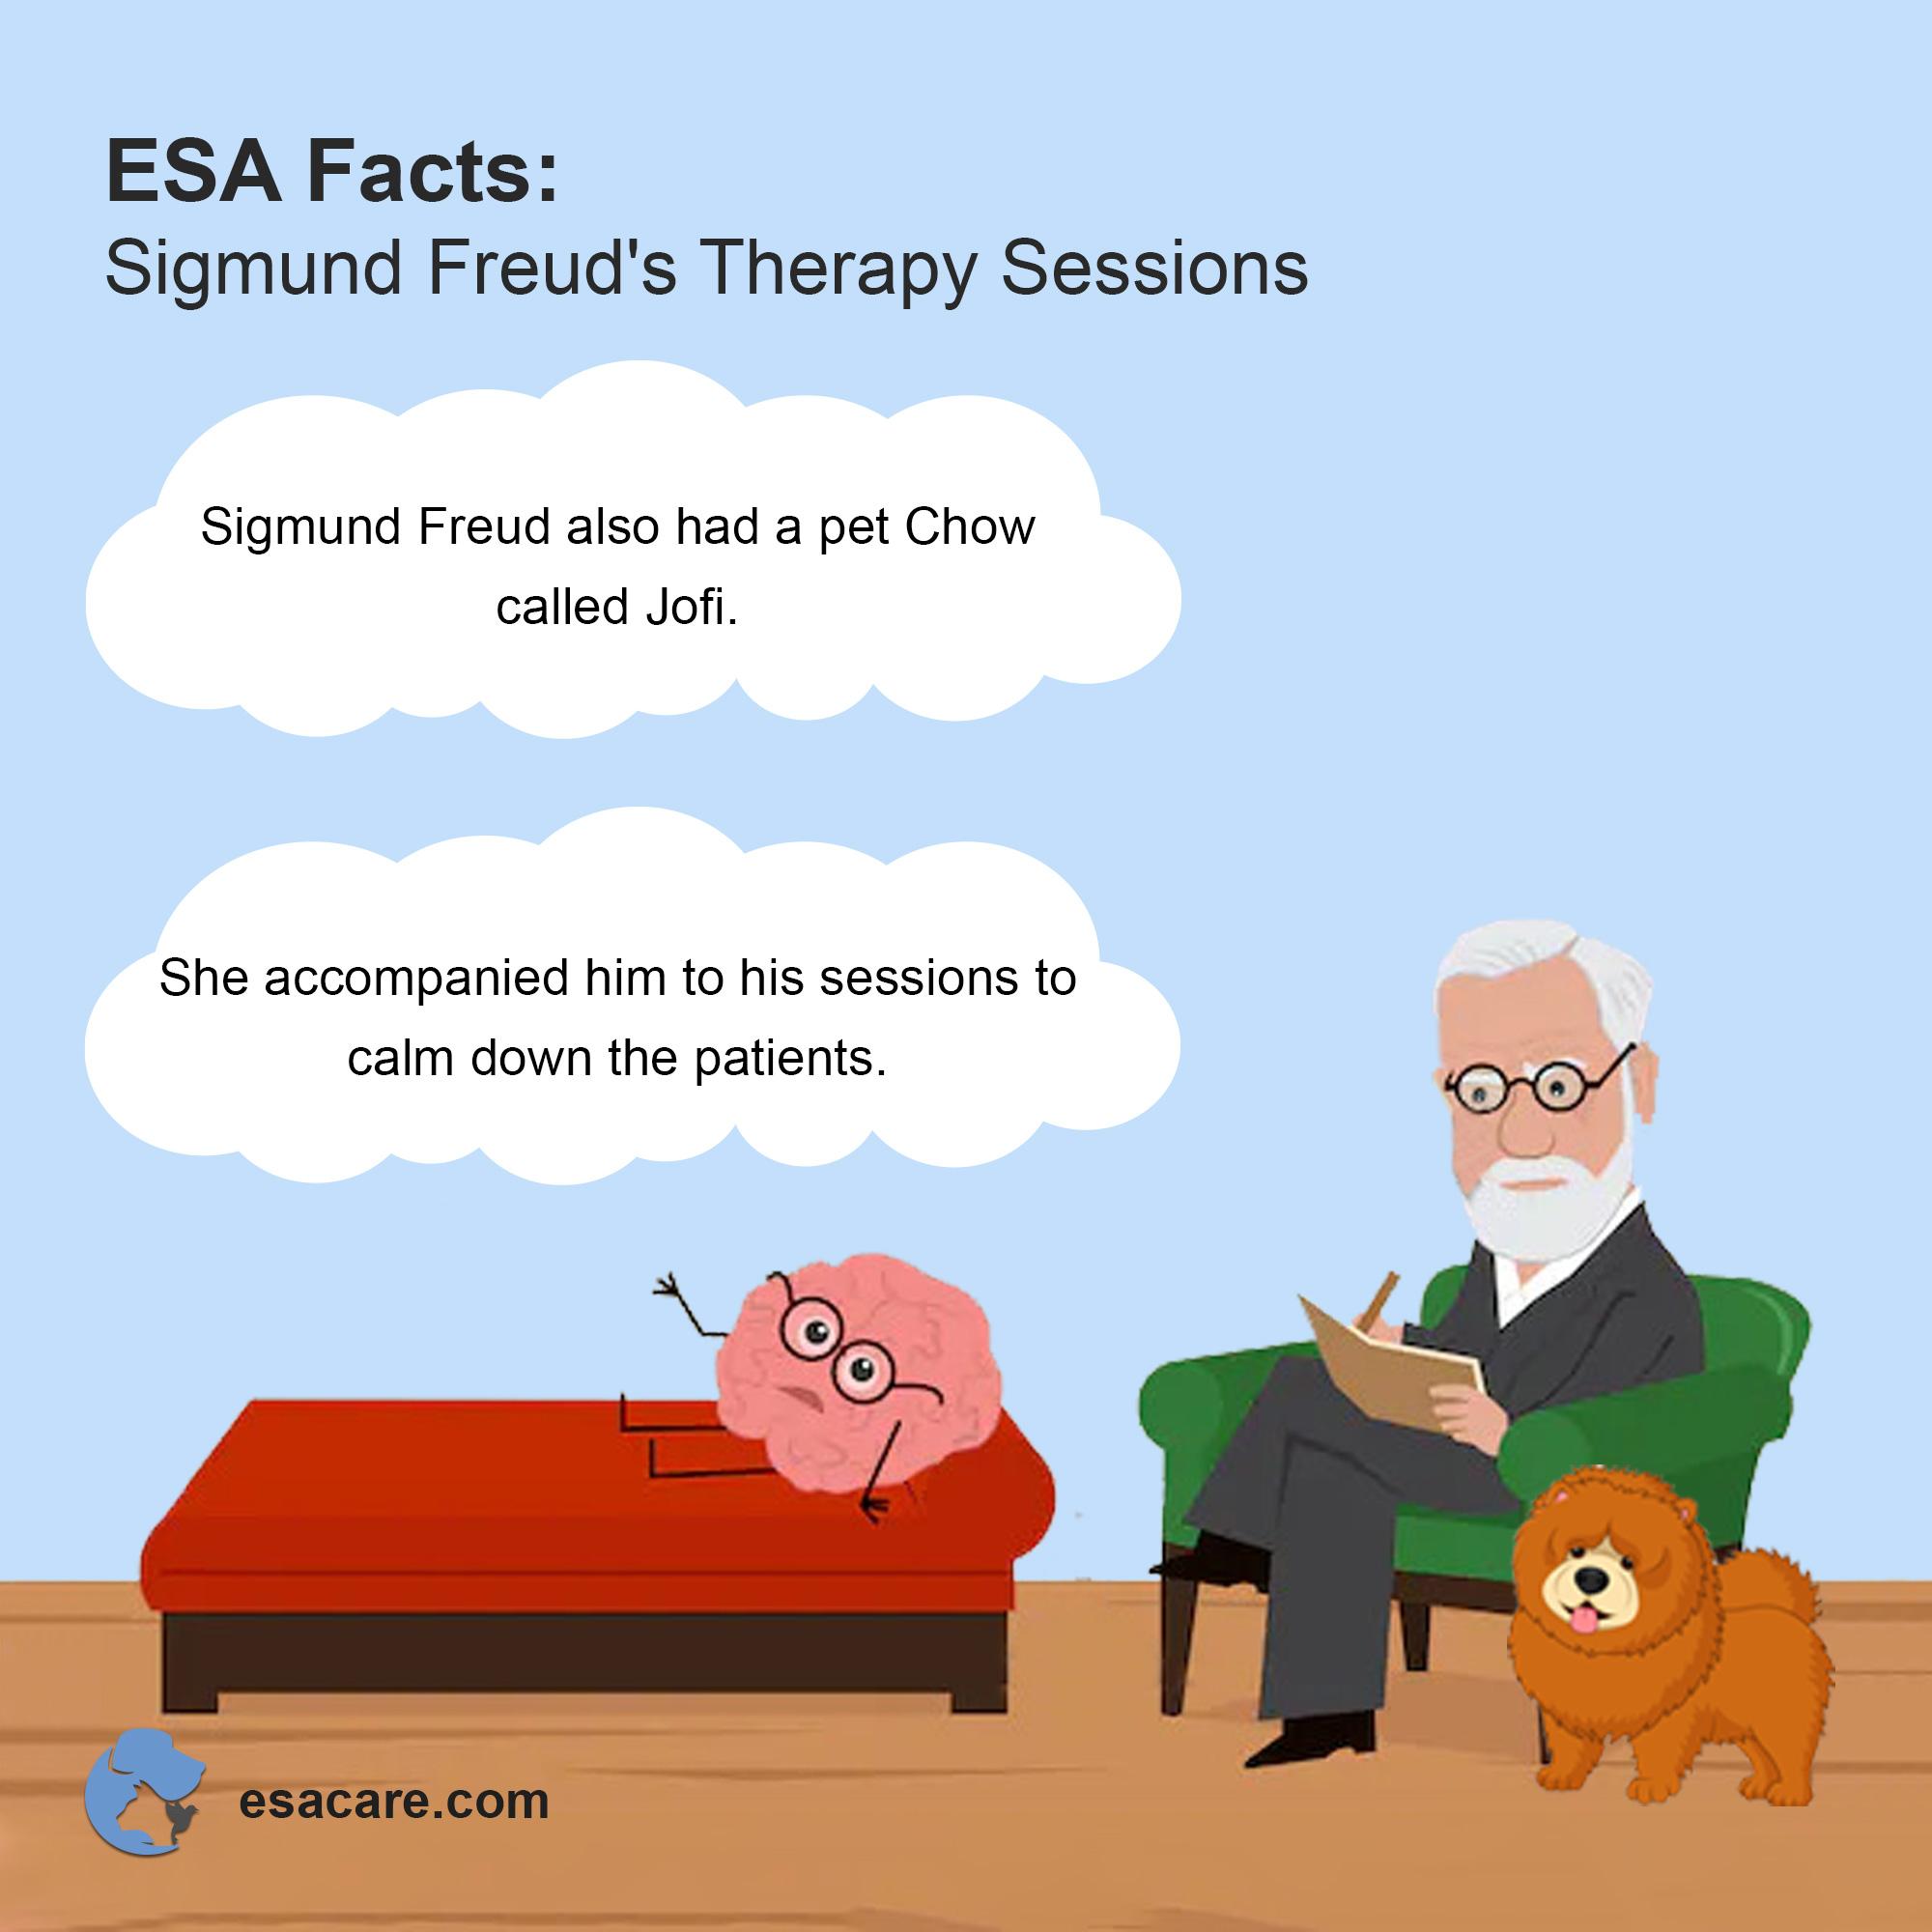 ESA Facts